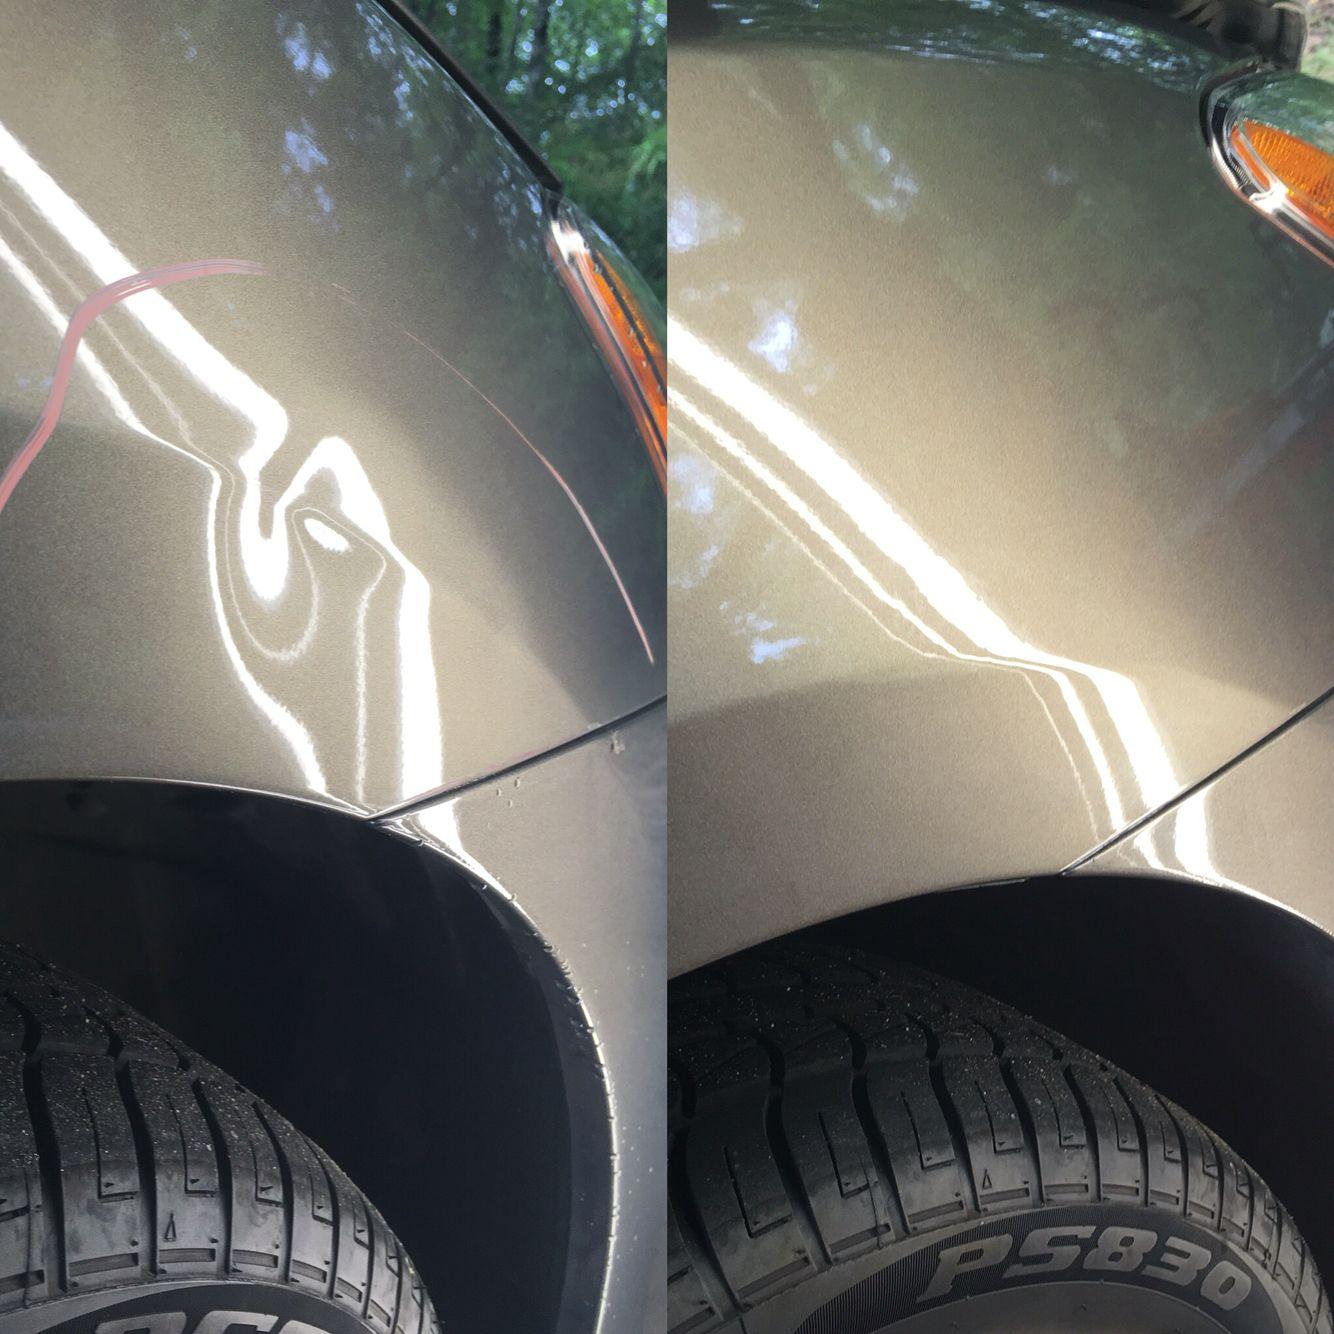 Paintless Dent Repair on a Nissan Sentra rental car turn